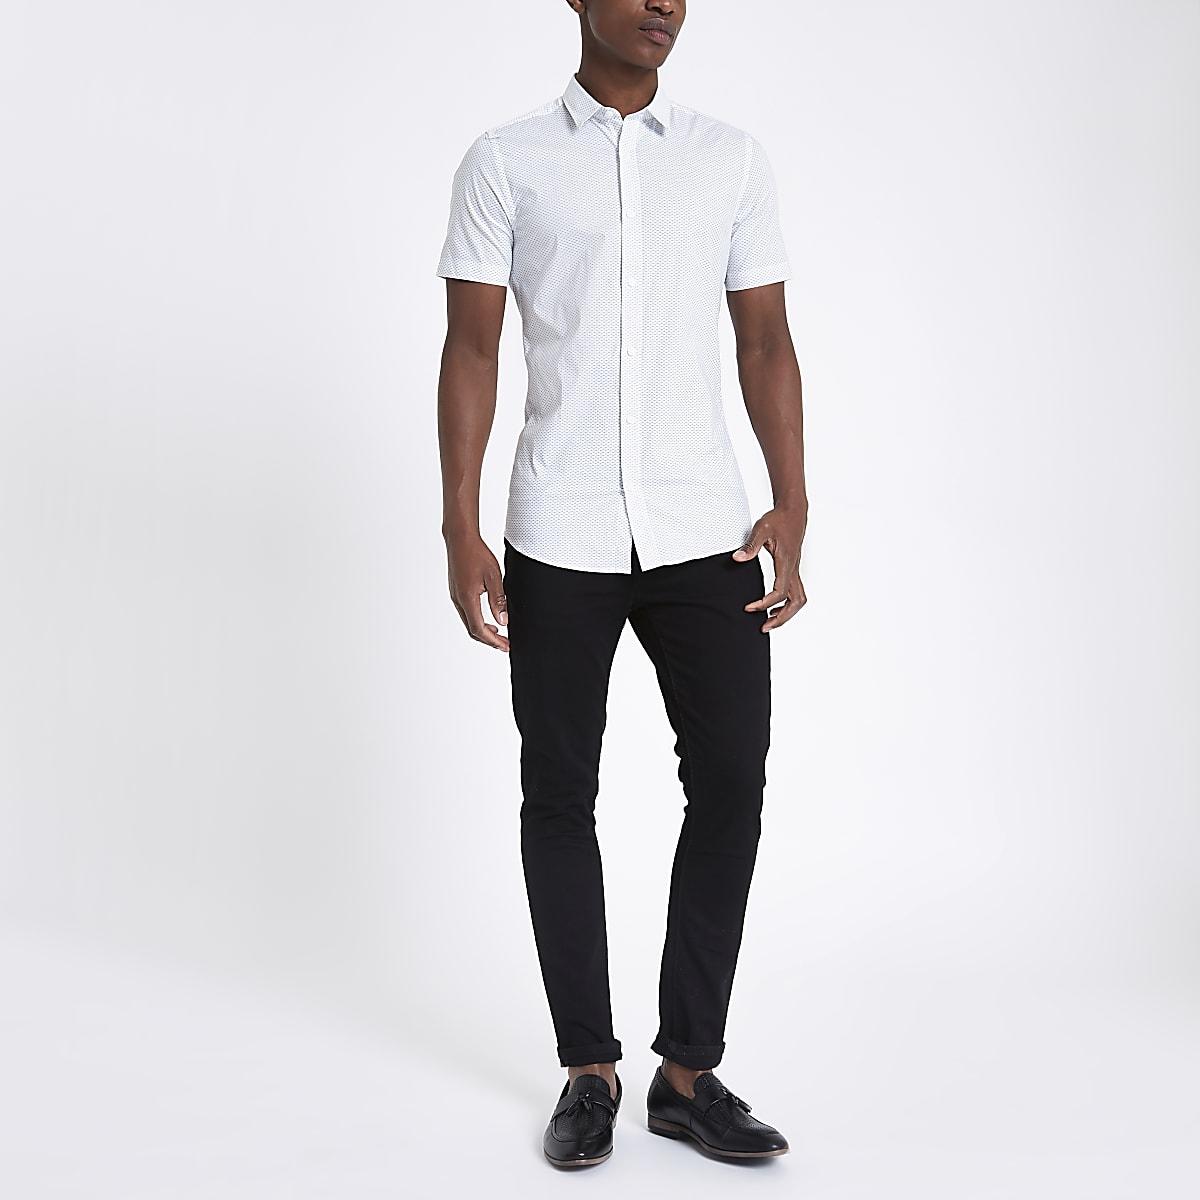 quality design 61c35 0aeba Only & Sons white short sleeve print shirt